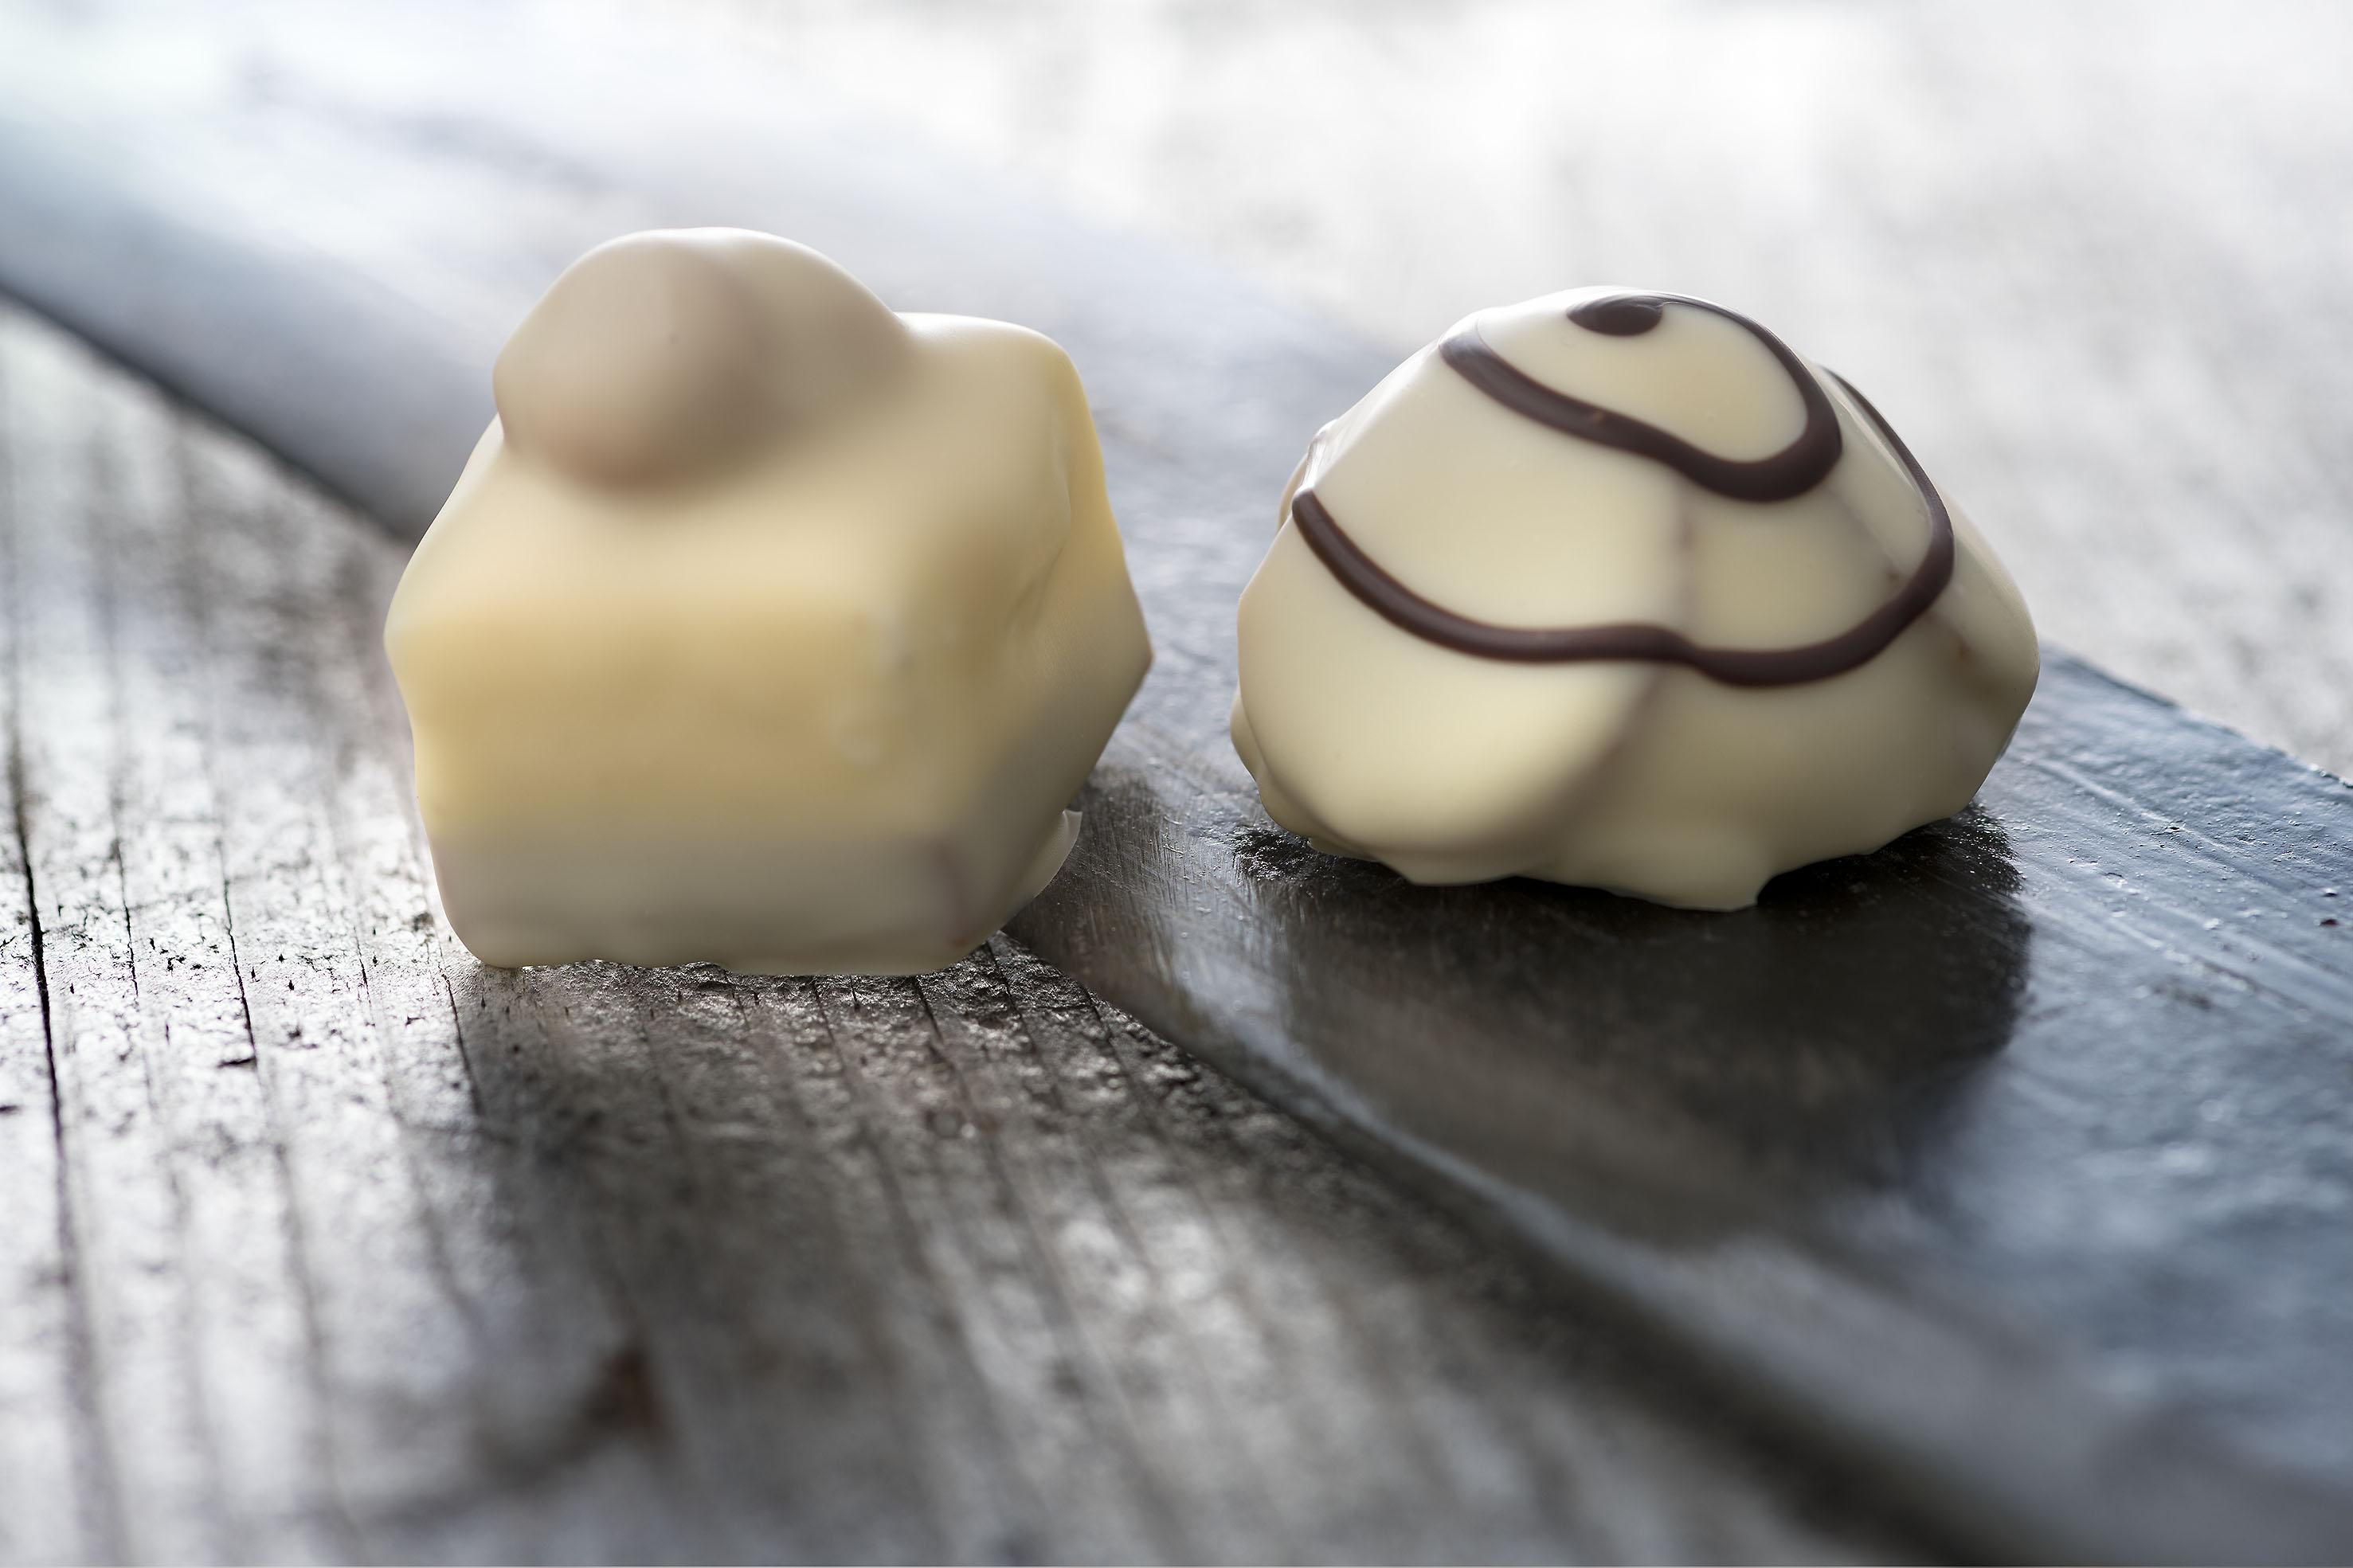 Arthur Los Fotografie - The Chocolate Line